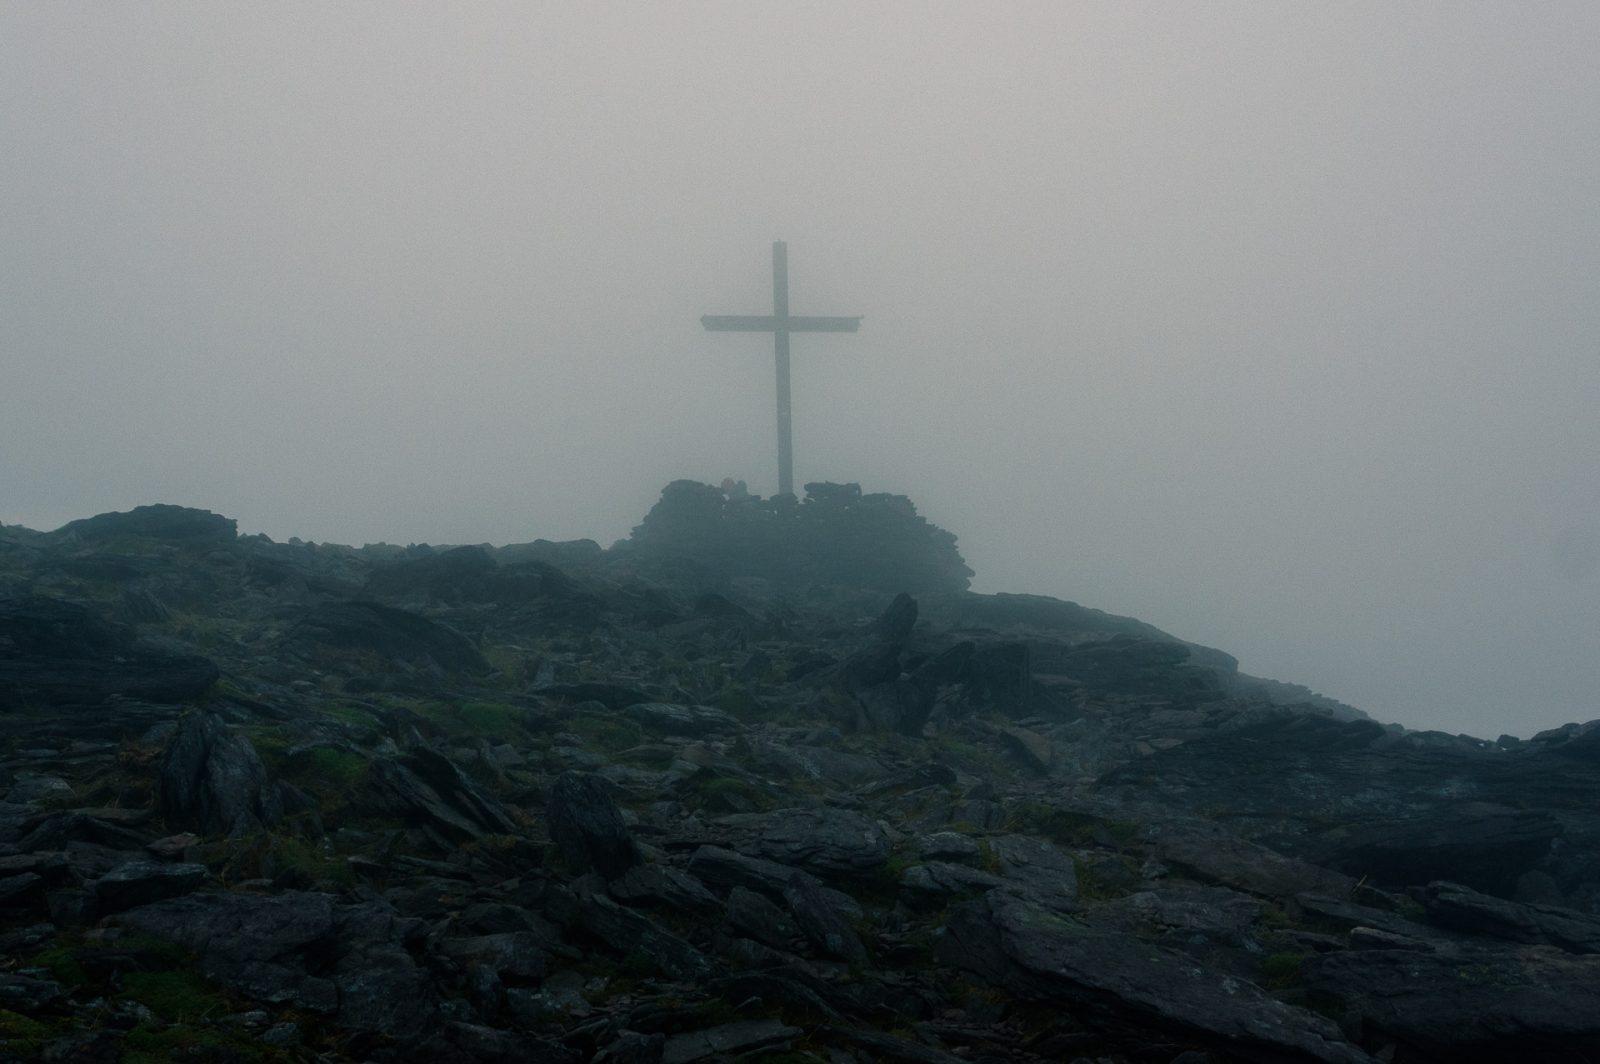 the cross on the summit of Carrauntoohil